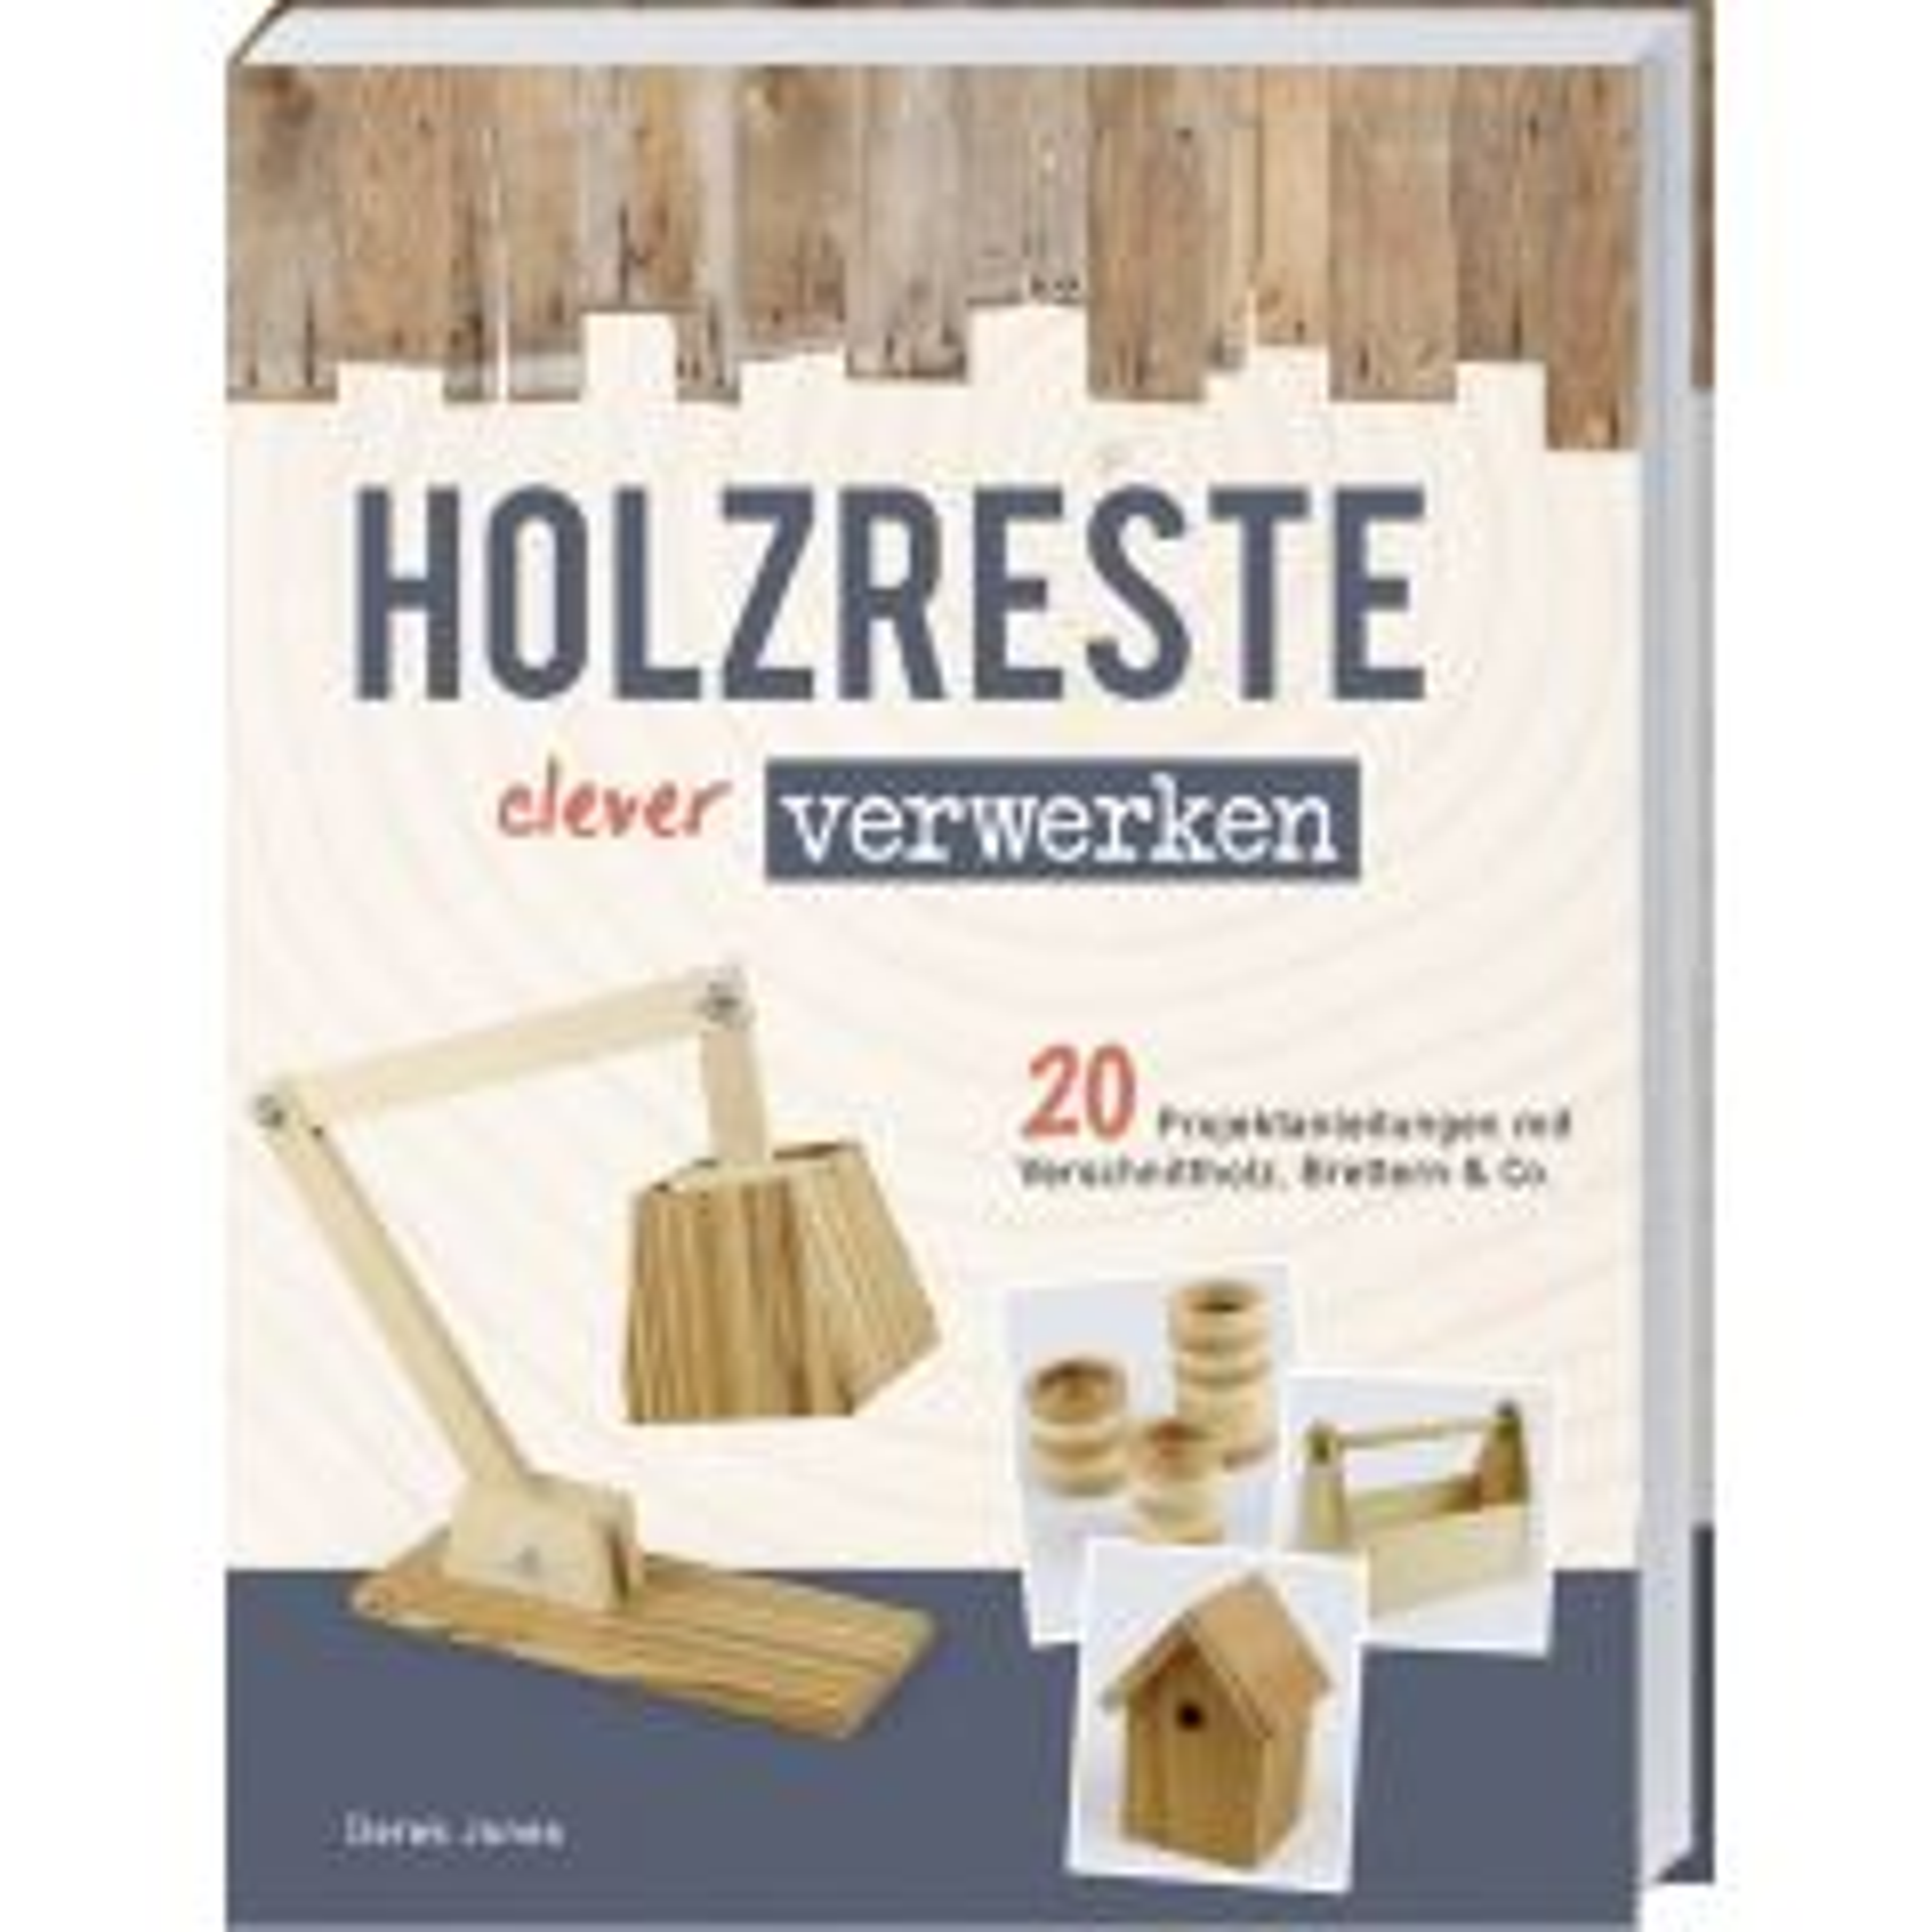 Holzreste clever verwerken